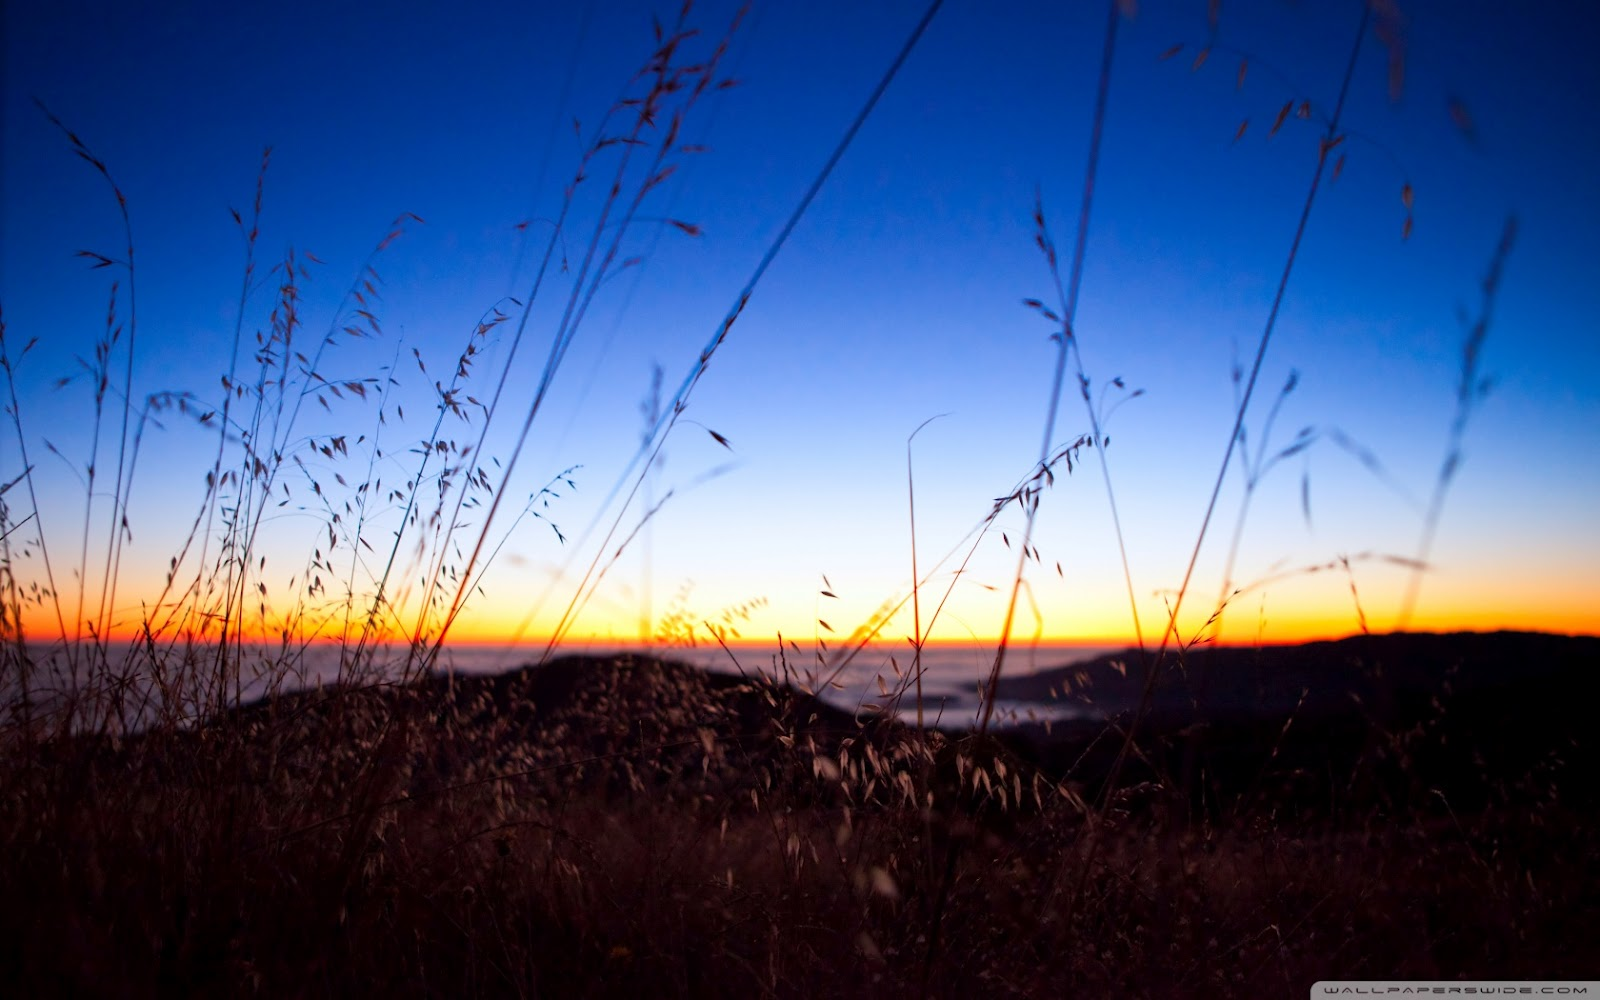 http://2.bp.blogspot.com/-HDS4tnvFqOE/T3oHa3YOmgI/AAAAAAAAE7I/EVTWLIIW30U/s1600/bokeh_sunset-wallpaper-1680x1050.jpg